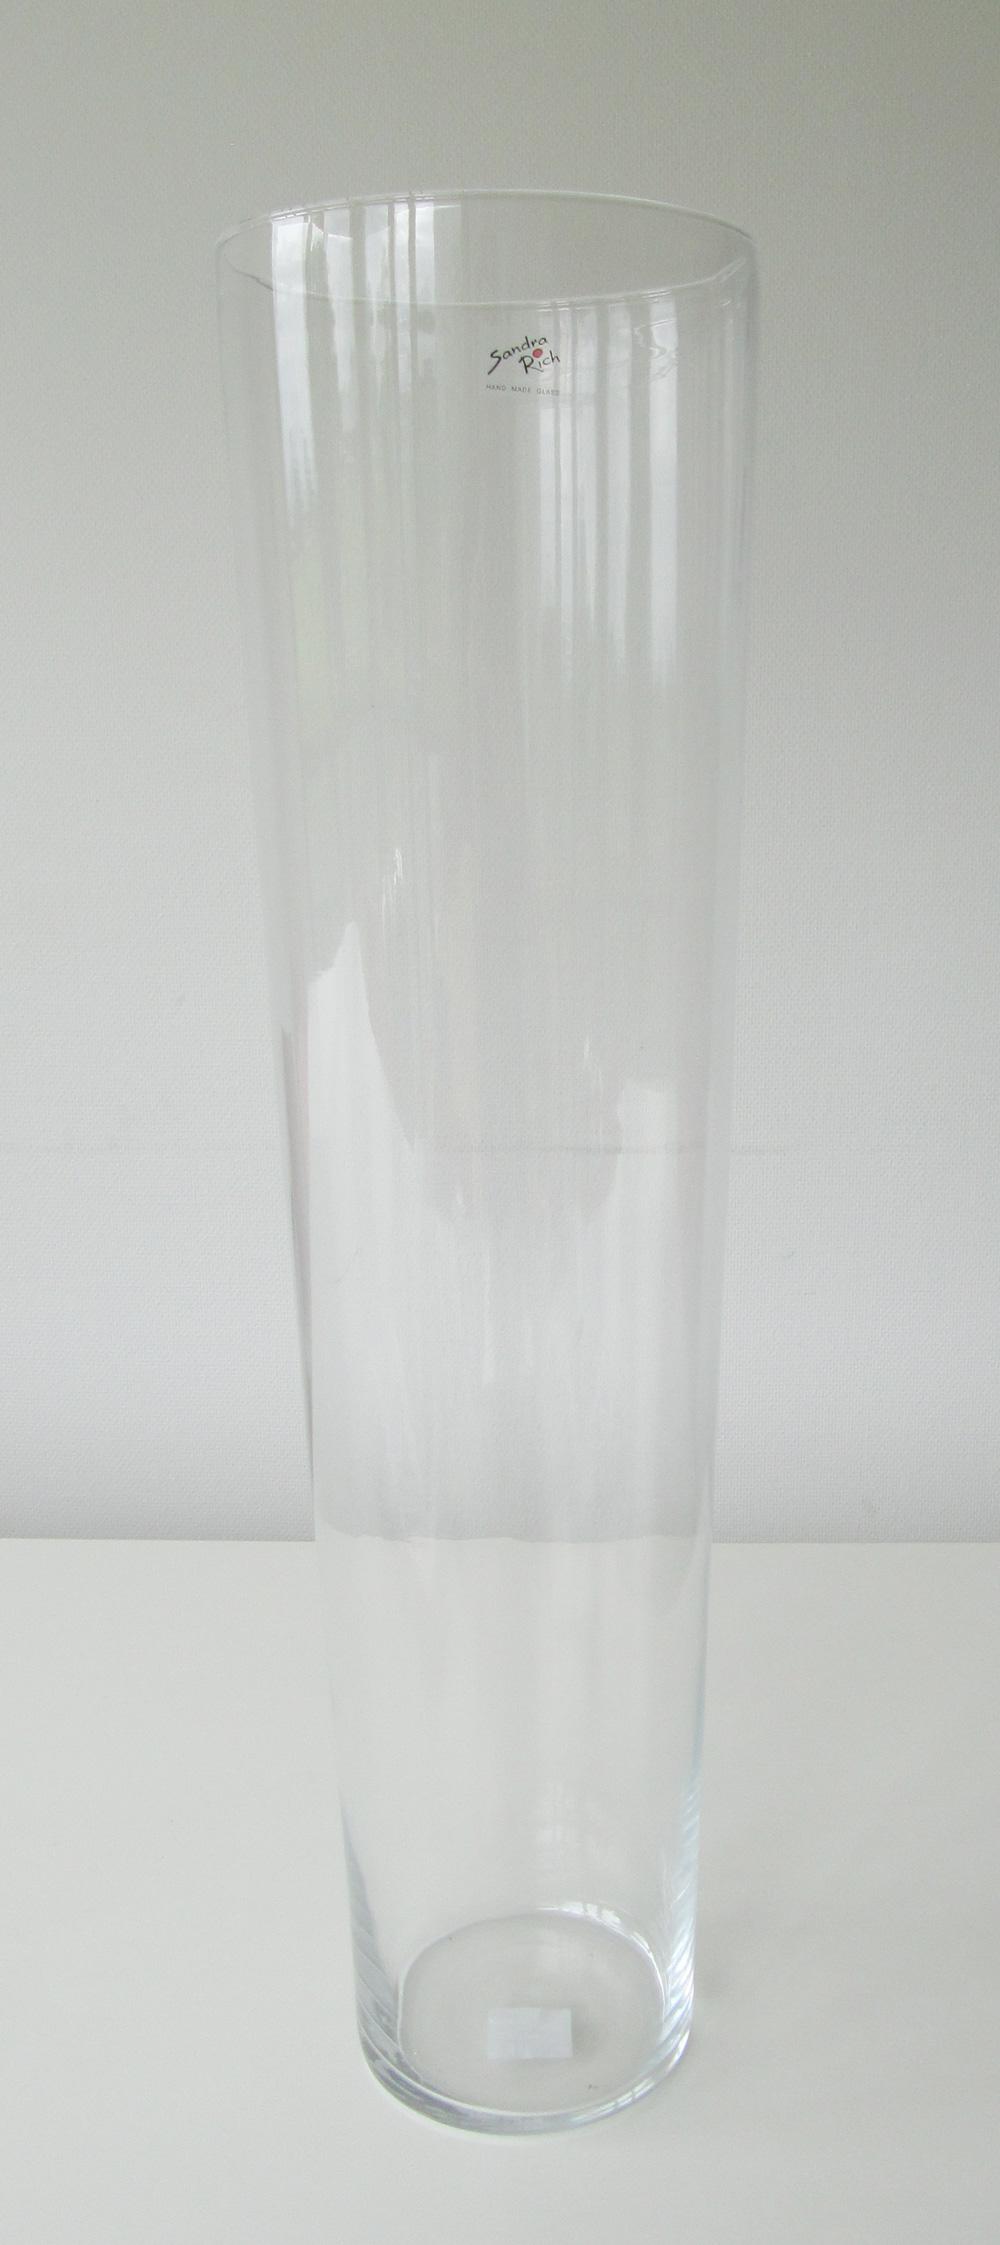 Glasvase Sandra Rich konisch Ø18xH70cm Bild 1